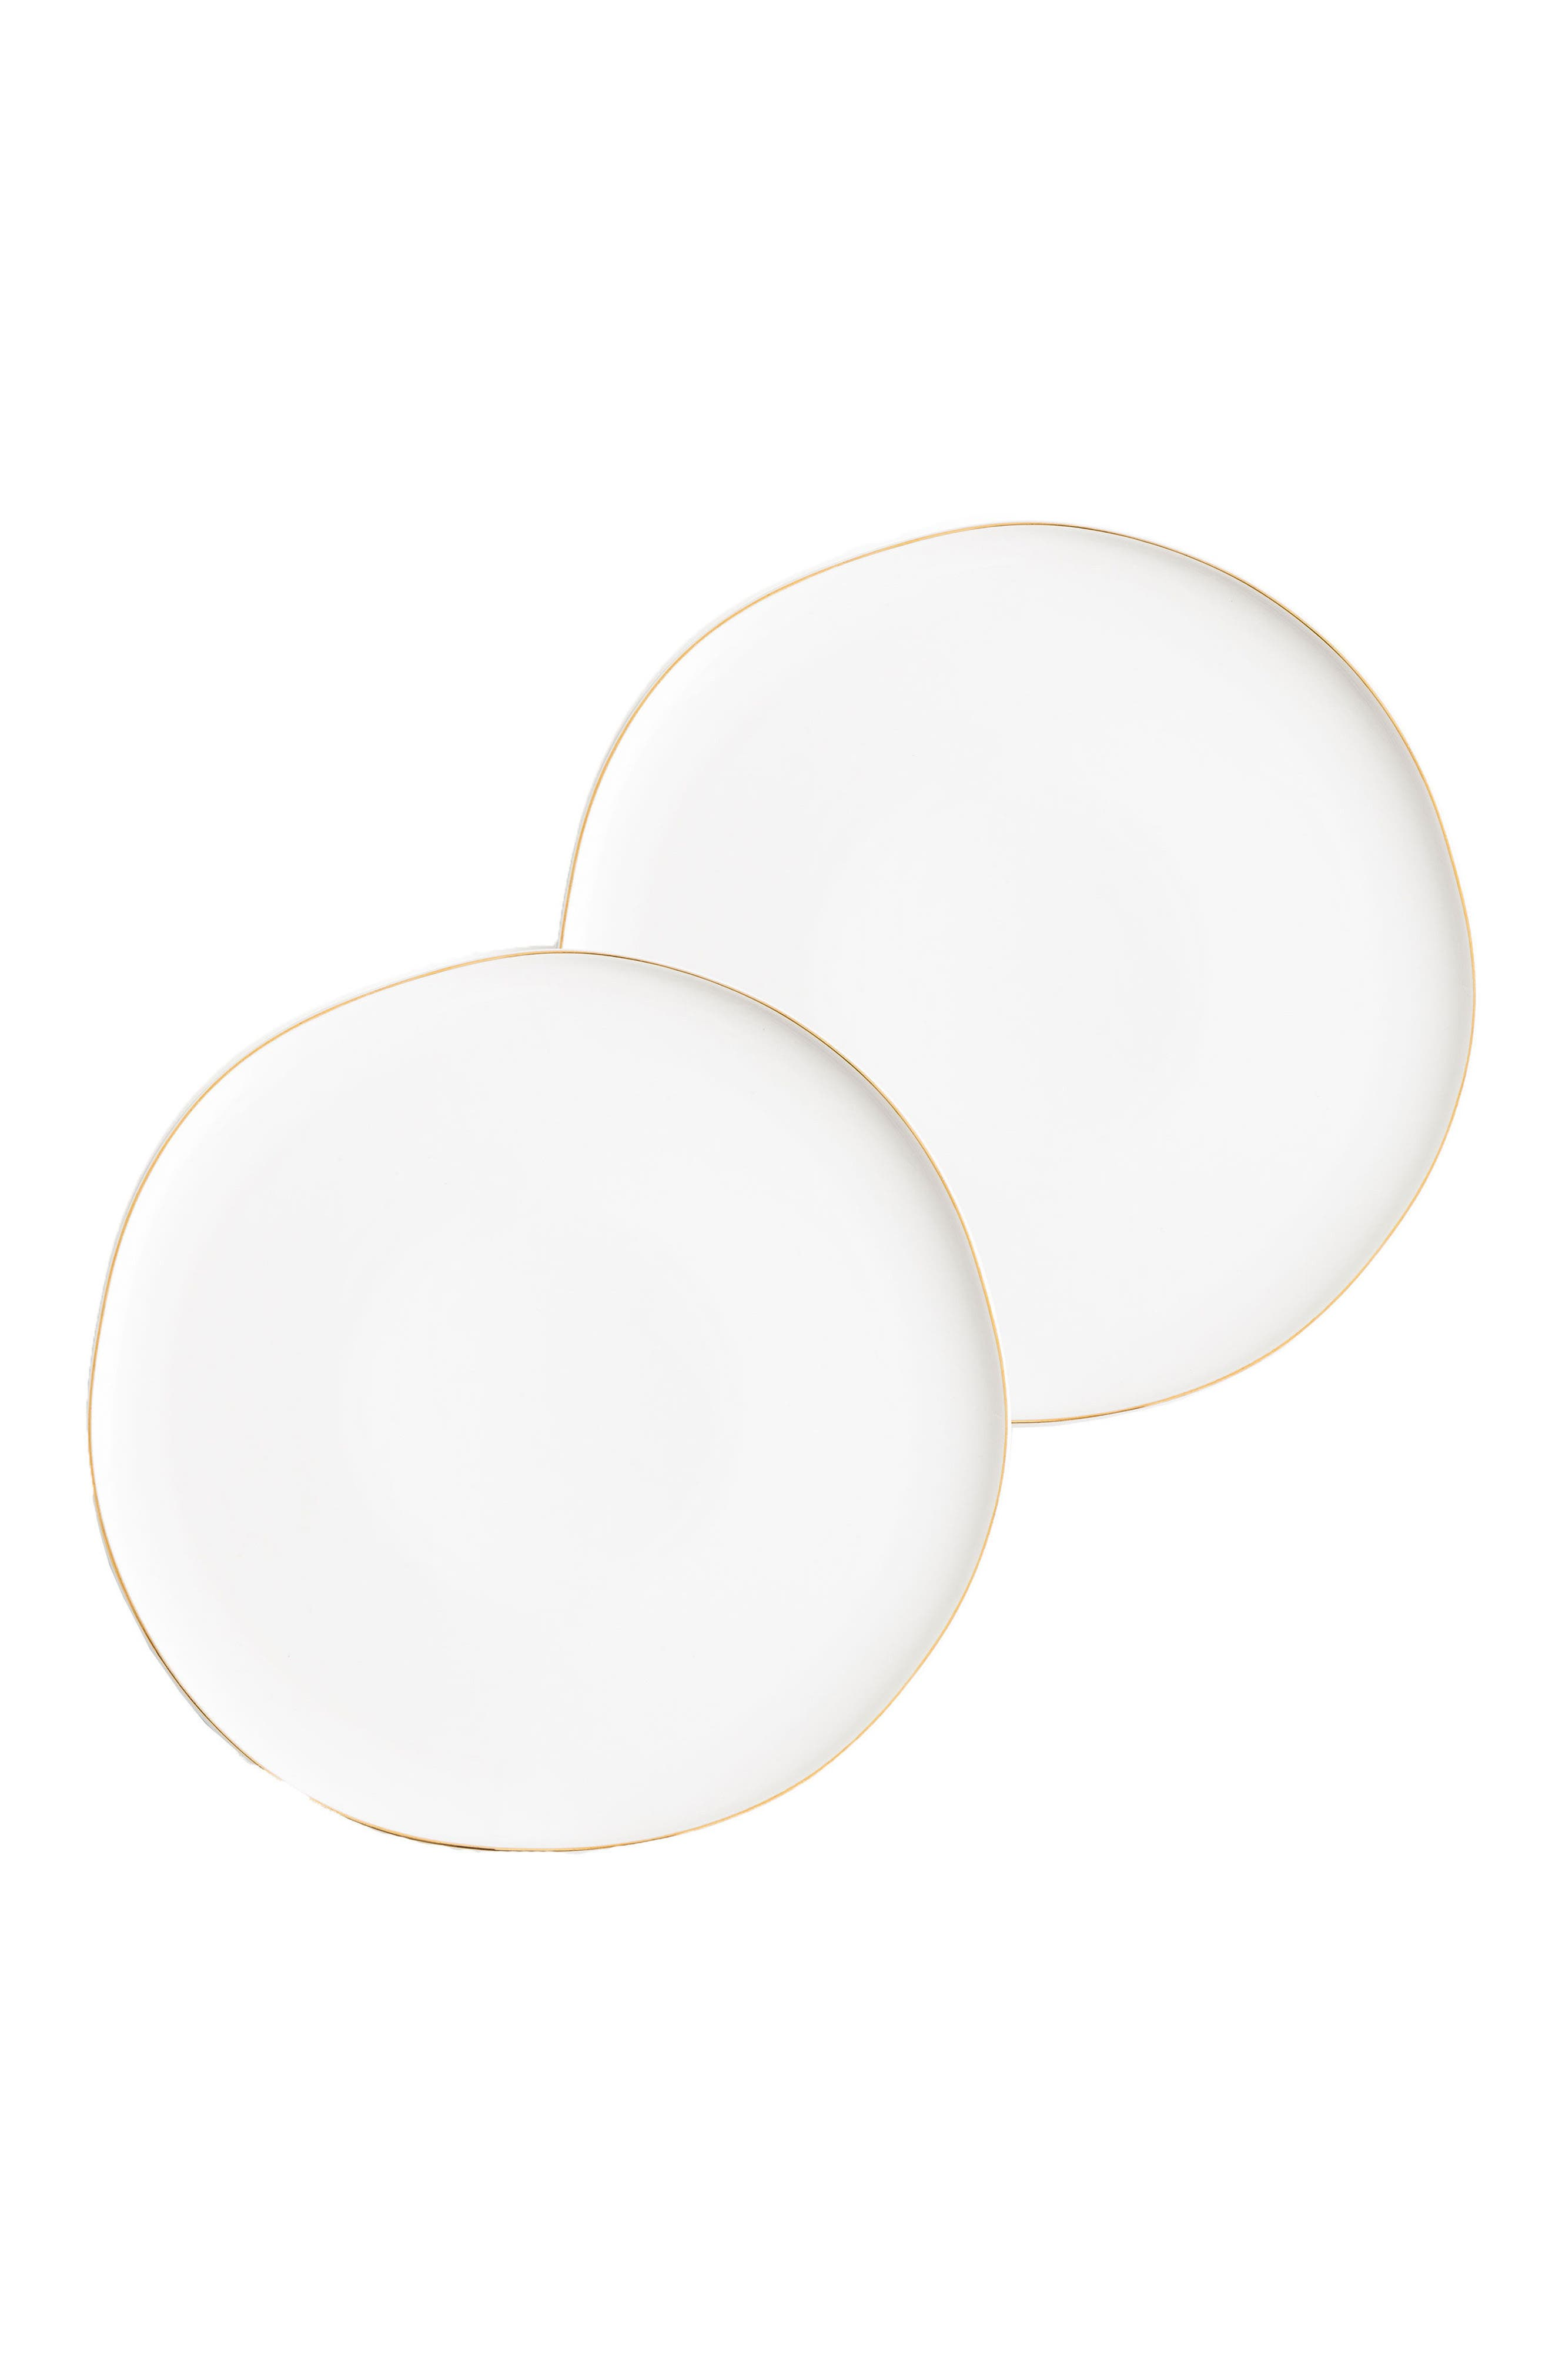 Rosanna Pacifica Set of 2 Plates